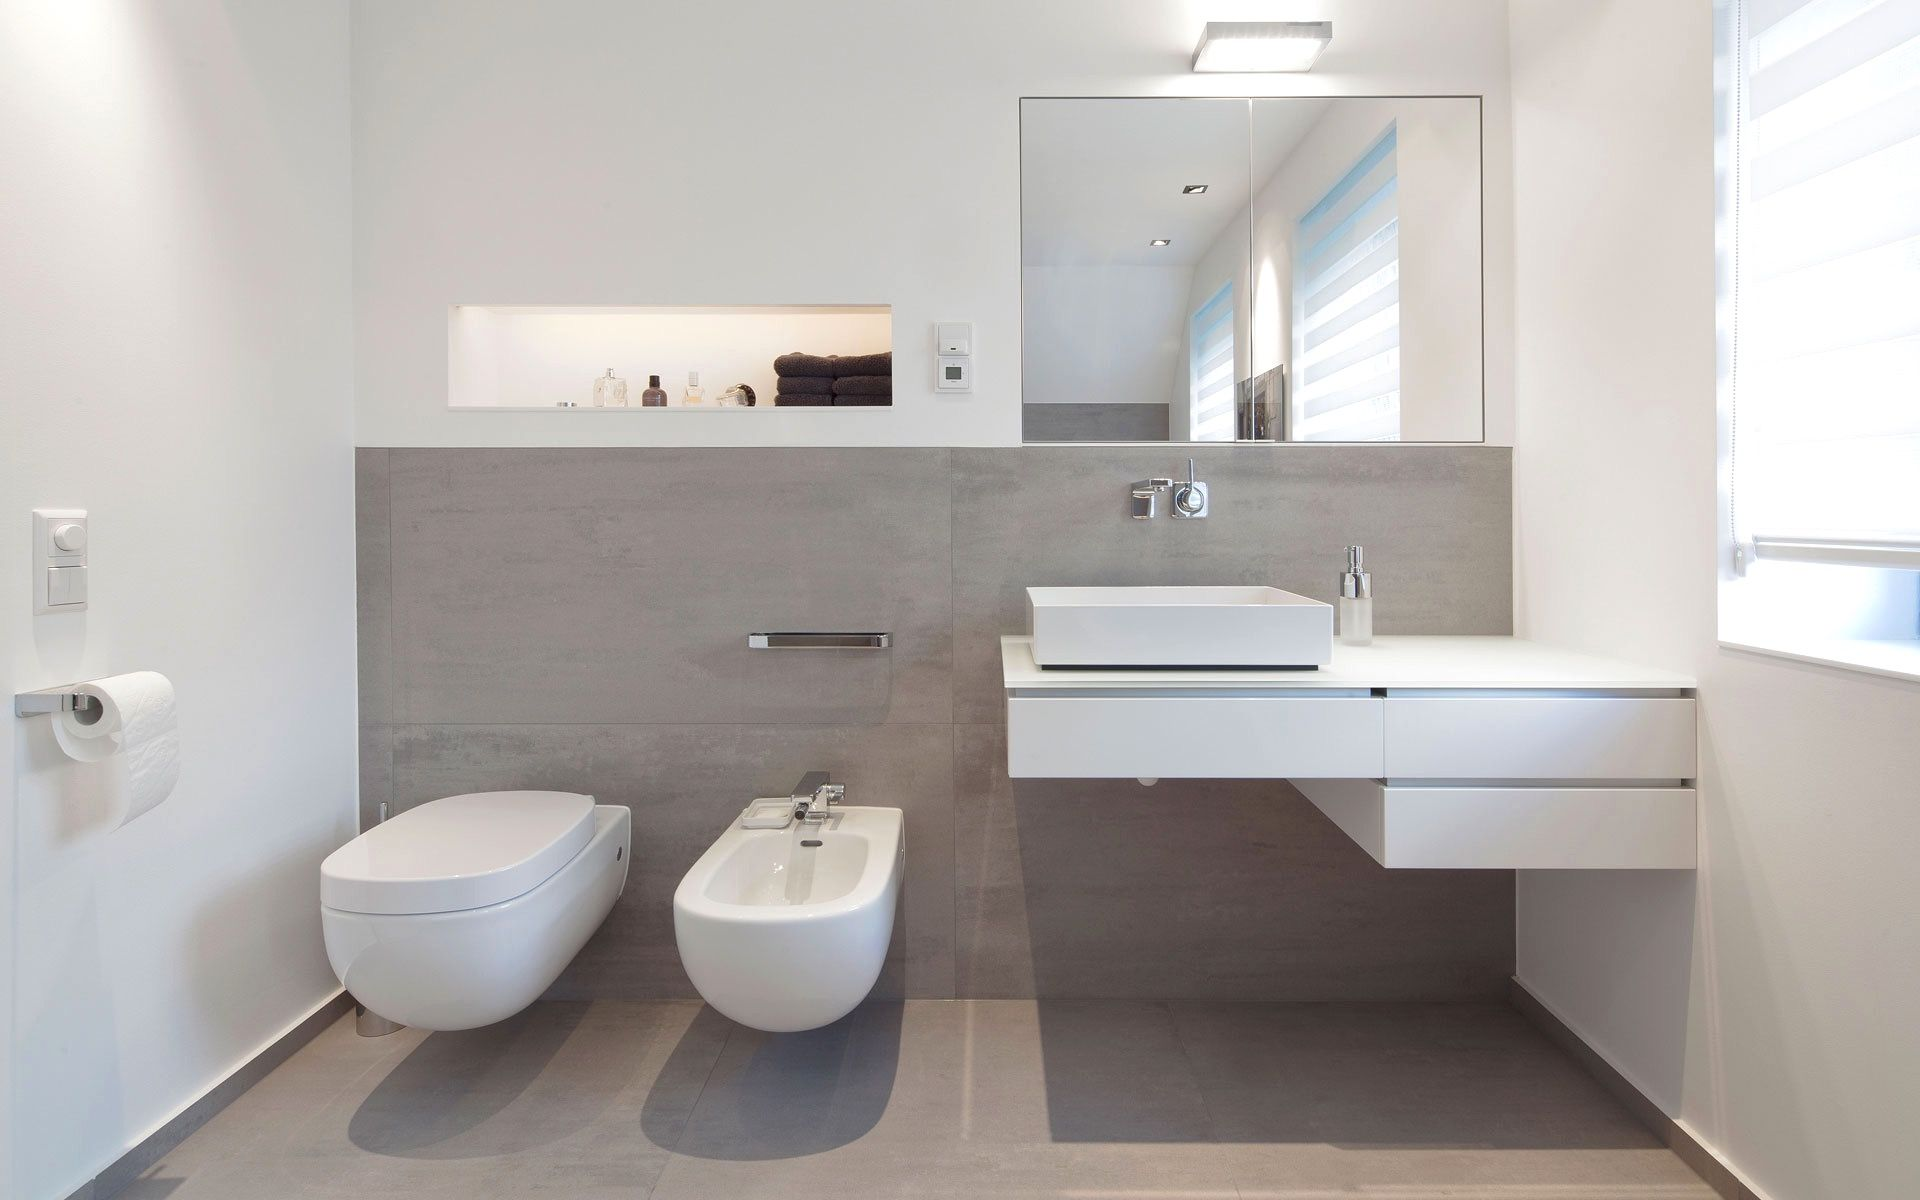 Badezimmer Ideen Fernen Verfuhrerisch Moderne Badezimmer Fliesen Badezimmer Fliesen Badezimmer Fliesen Grau Badezimmer Ideen Grau